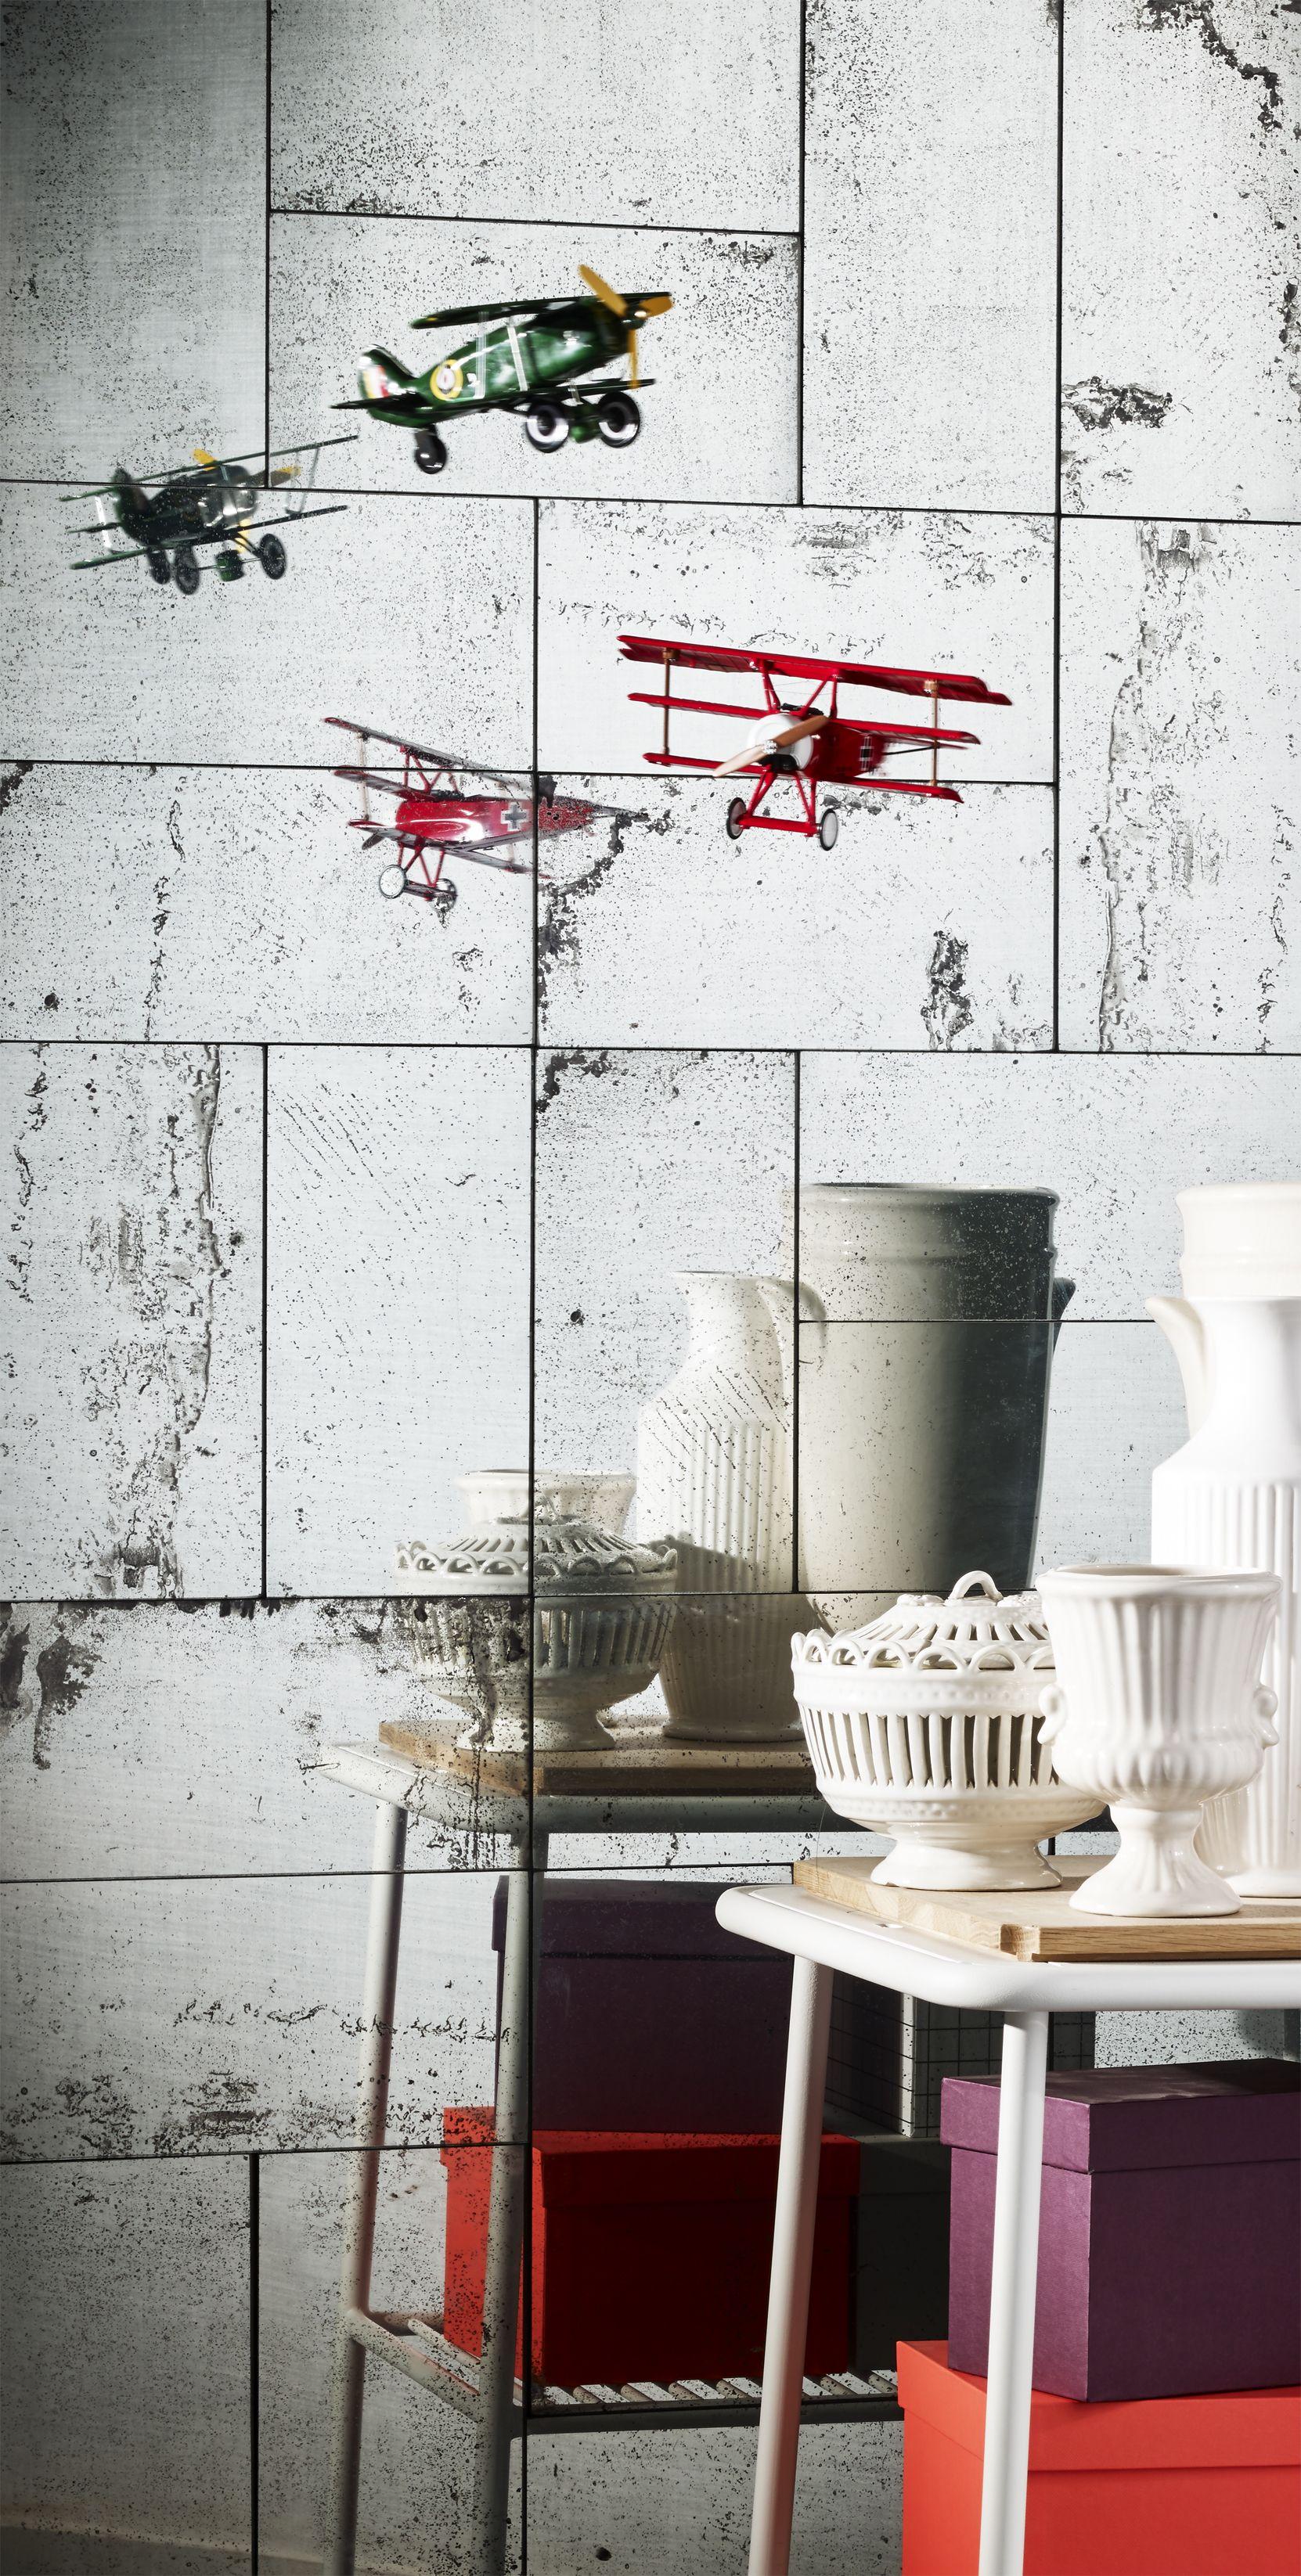 Tiles #41zero42 #Manchester #Bathroom #Flooring #Porcelain #Walls ...